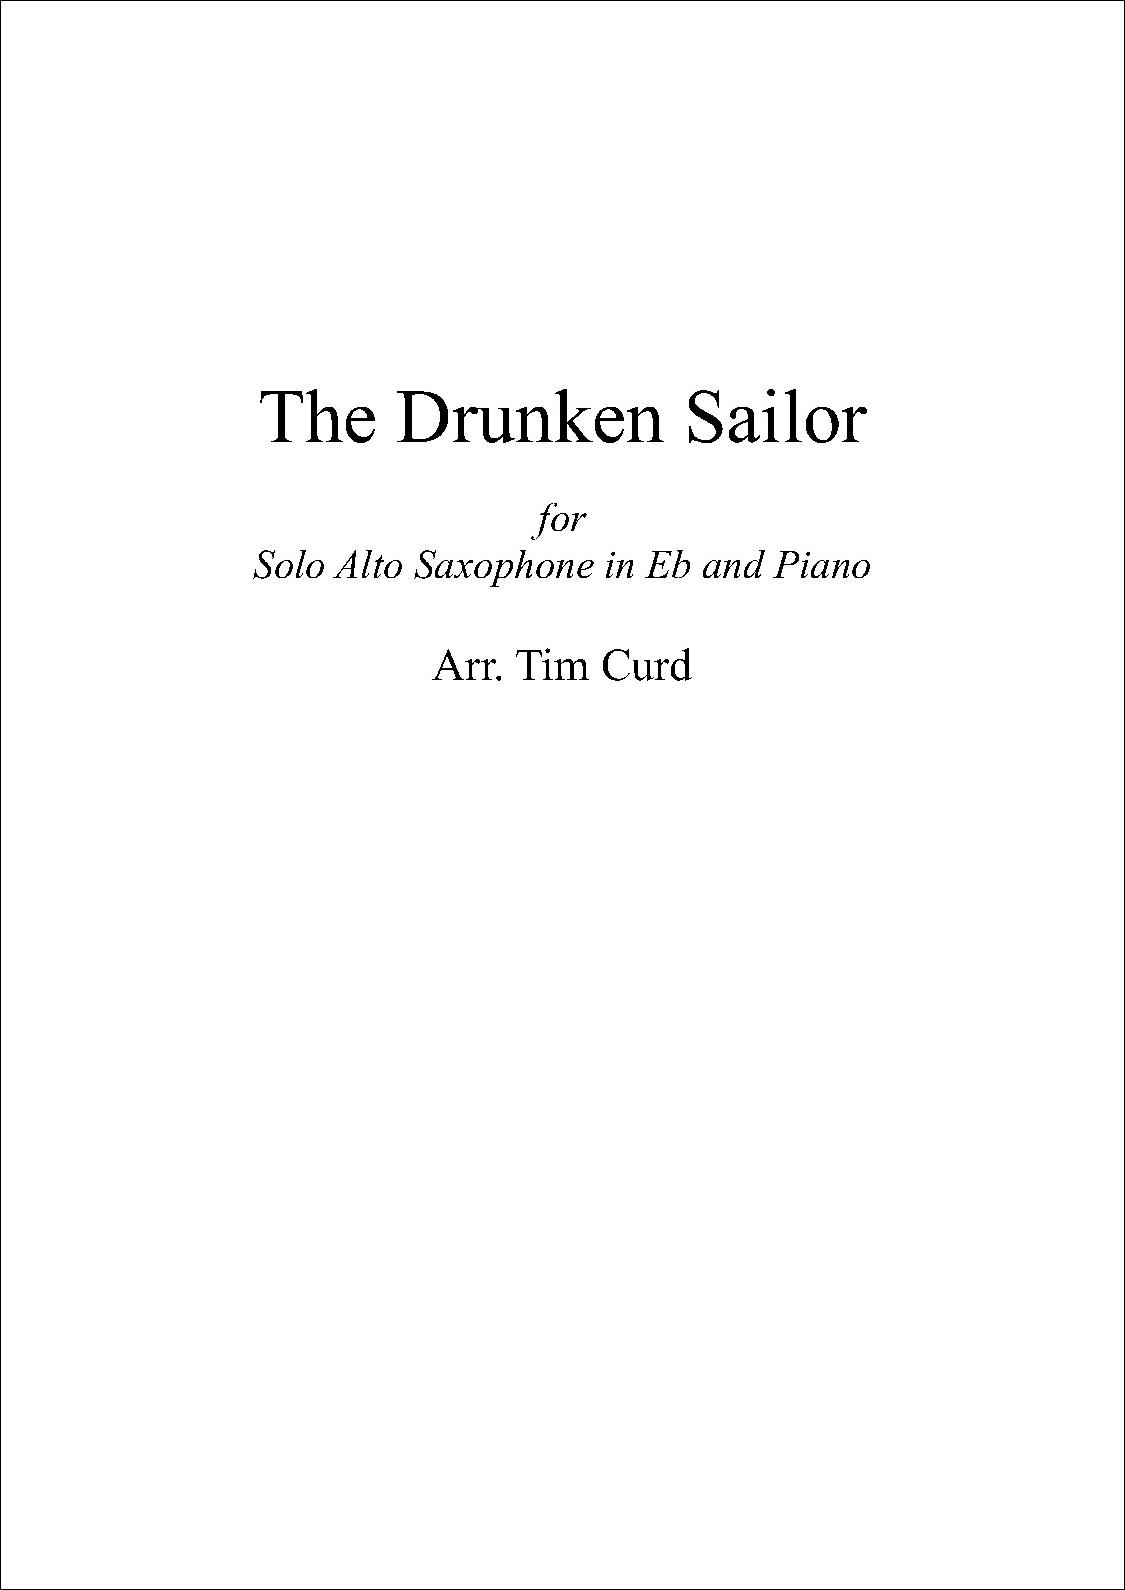 The Drunken Sailor